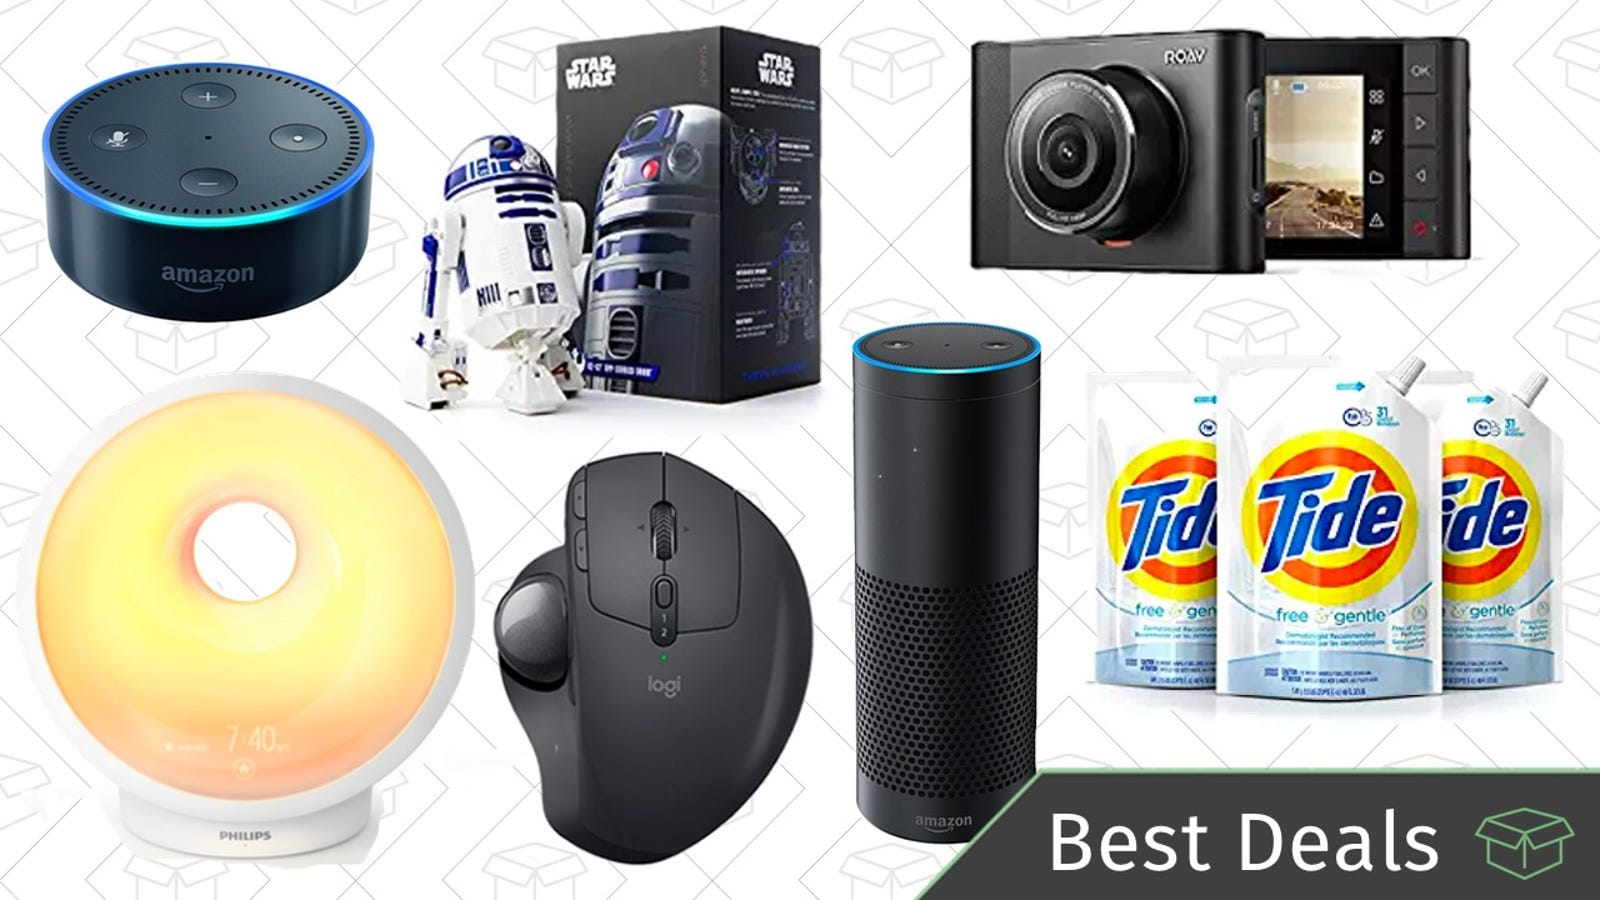 Fridays best deals wake up lights amazon smart speakers r2 d2 fridays best deals wake up lights amazon smart speakers r2 d2 droid and more fandeluxe Images